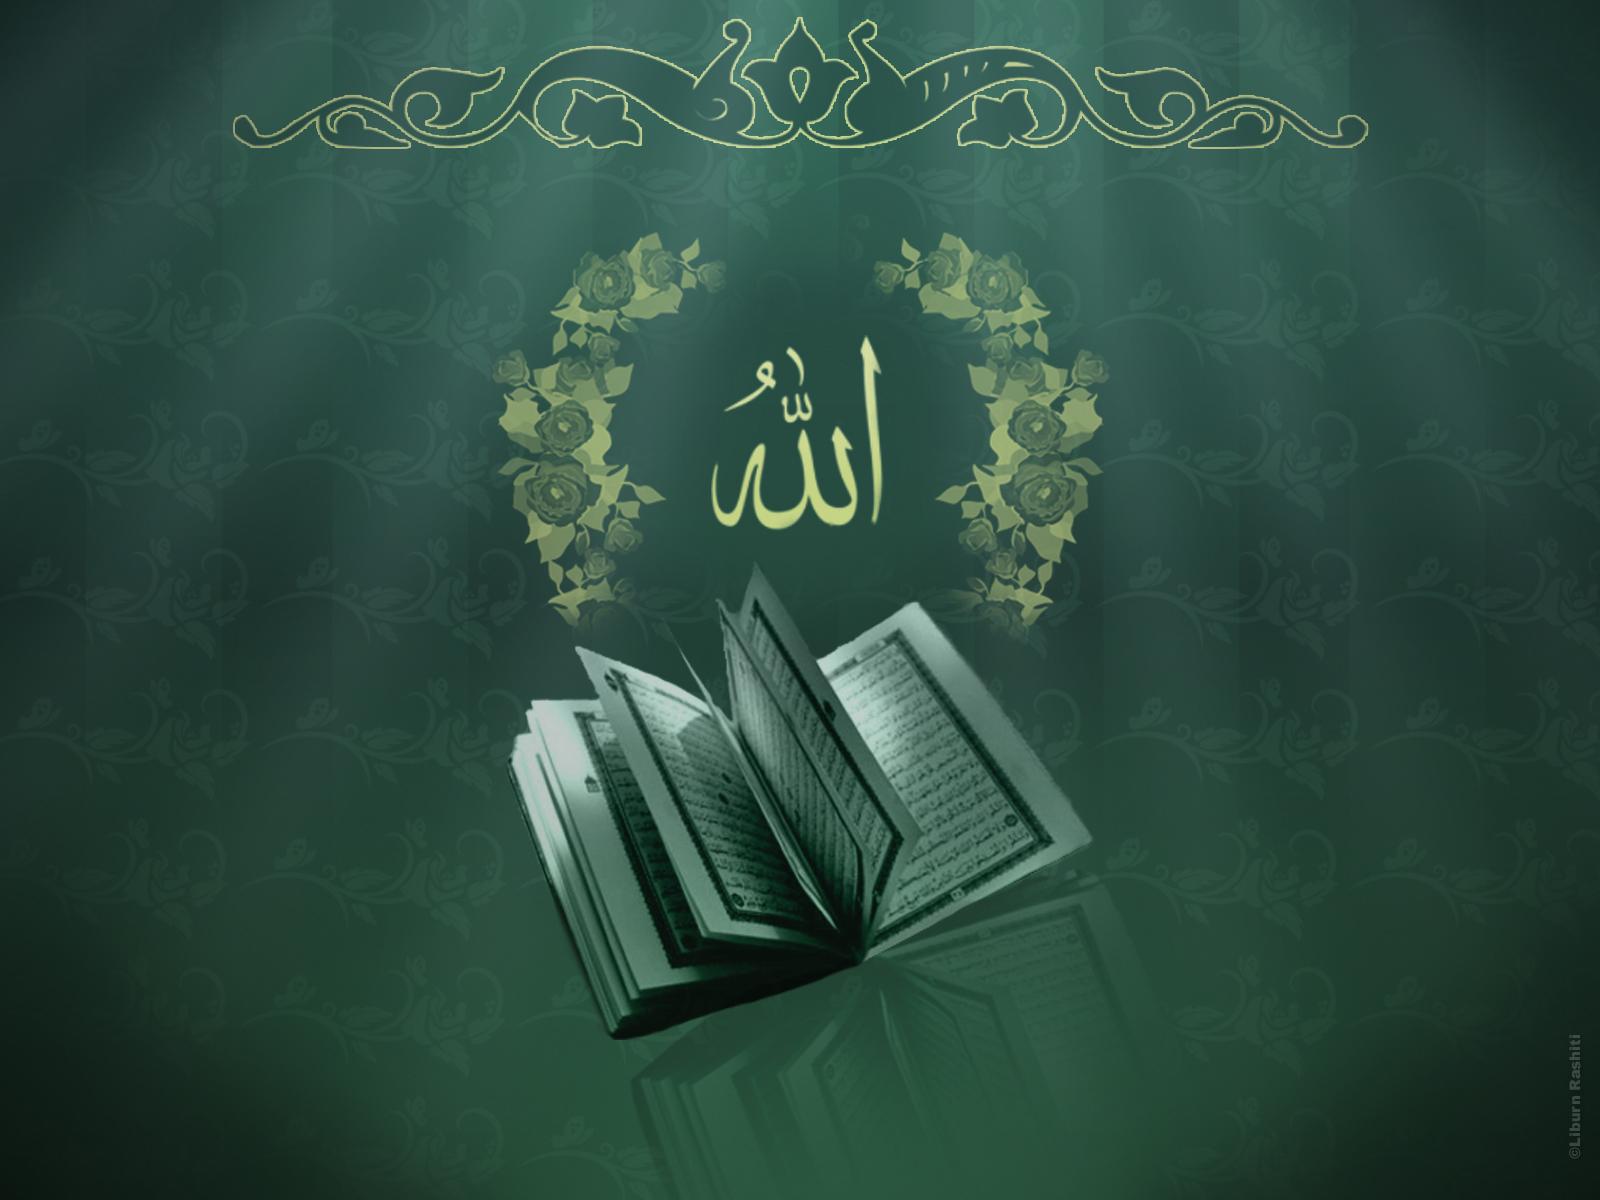 islamic hd wallpapers islamic hd wallpapers islamic hd wallpapers 1600x1200